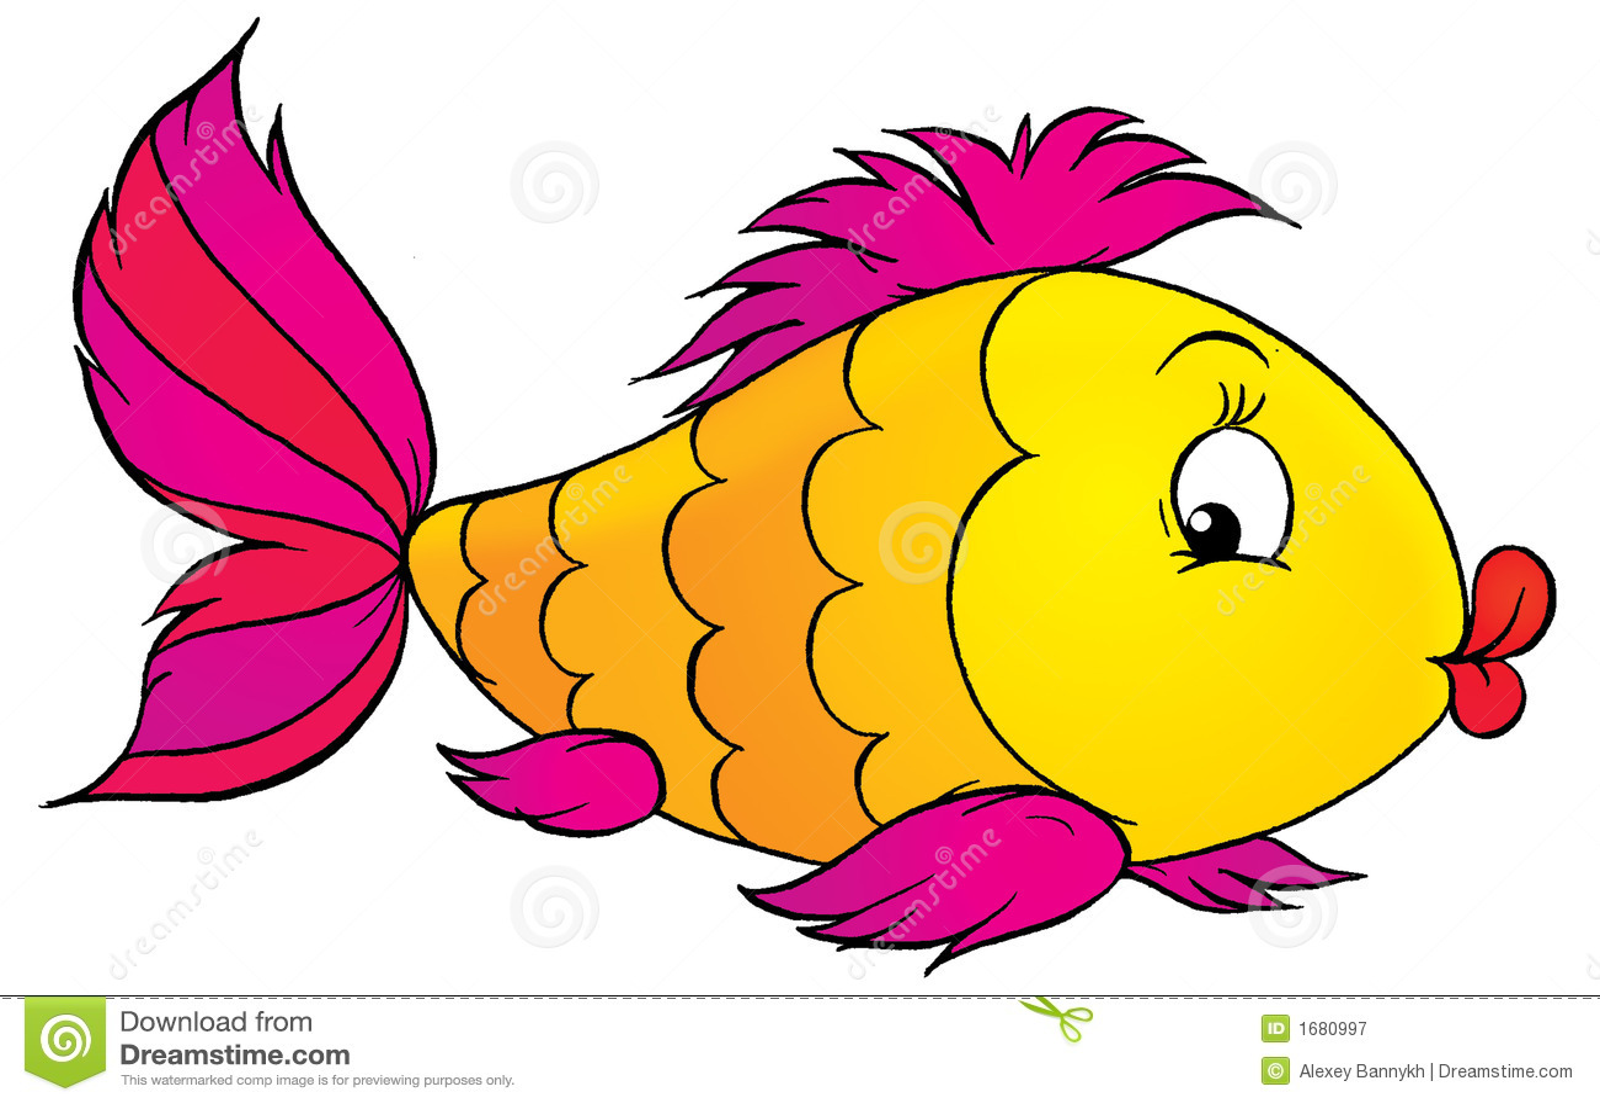 coral fish stock illustration illustration of clip album 1680997 rh dreamstime com corel clip art browser corral clip art